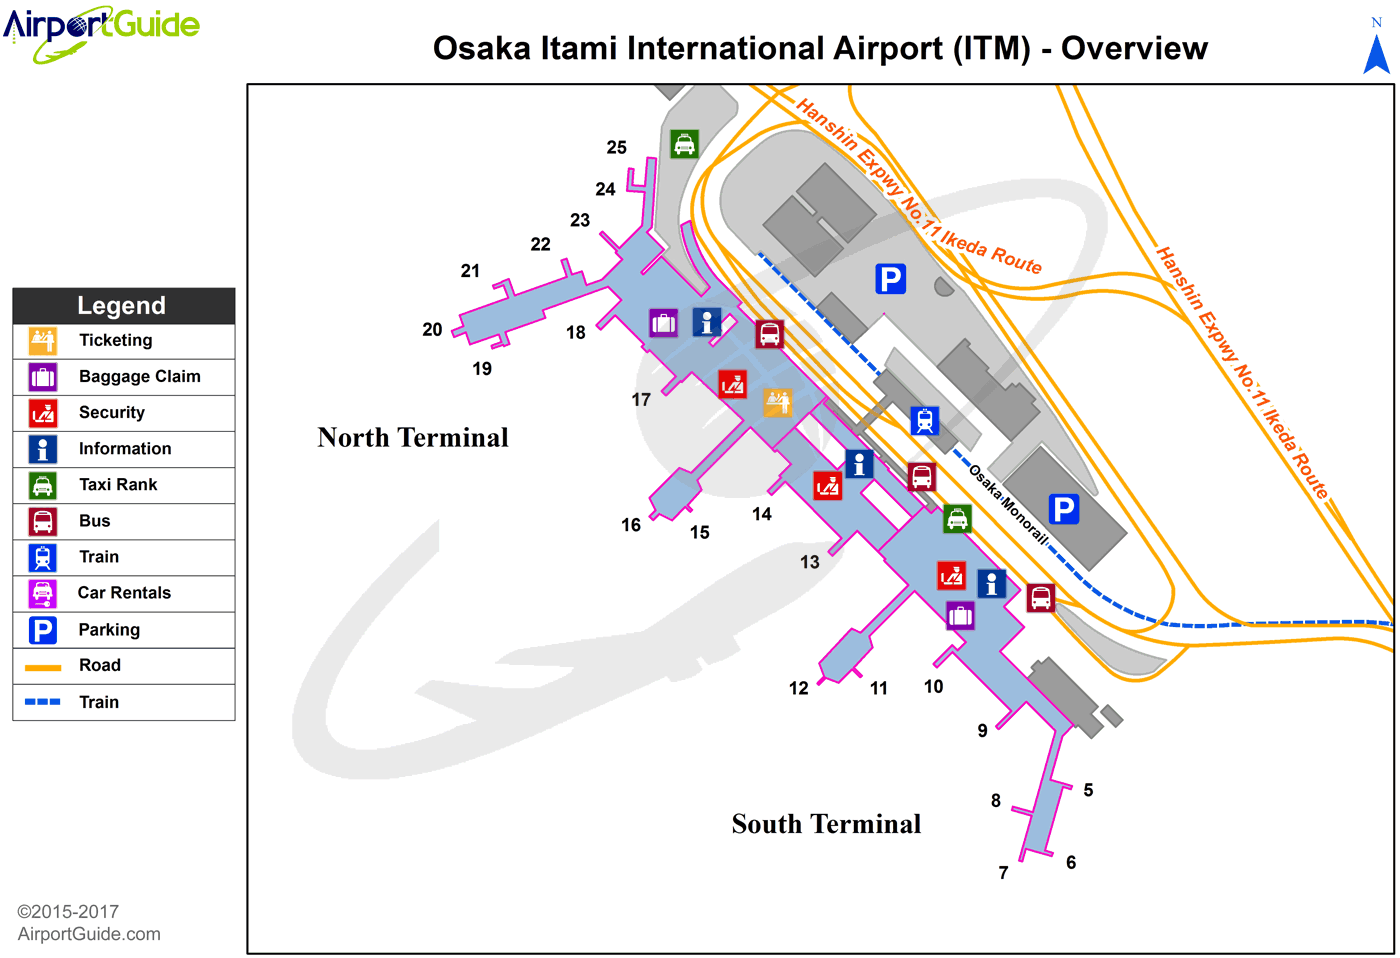 osaka itami airport map Osaka Osaka International Itm Airport Terminal Map Overview osaka itami airport map